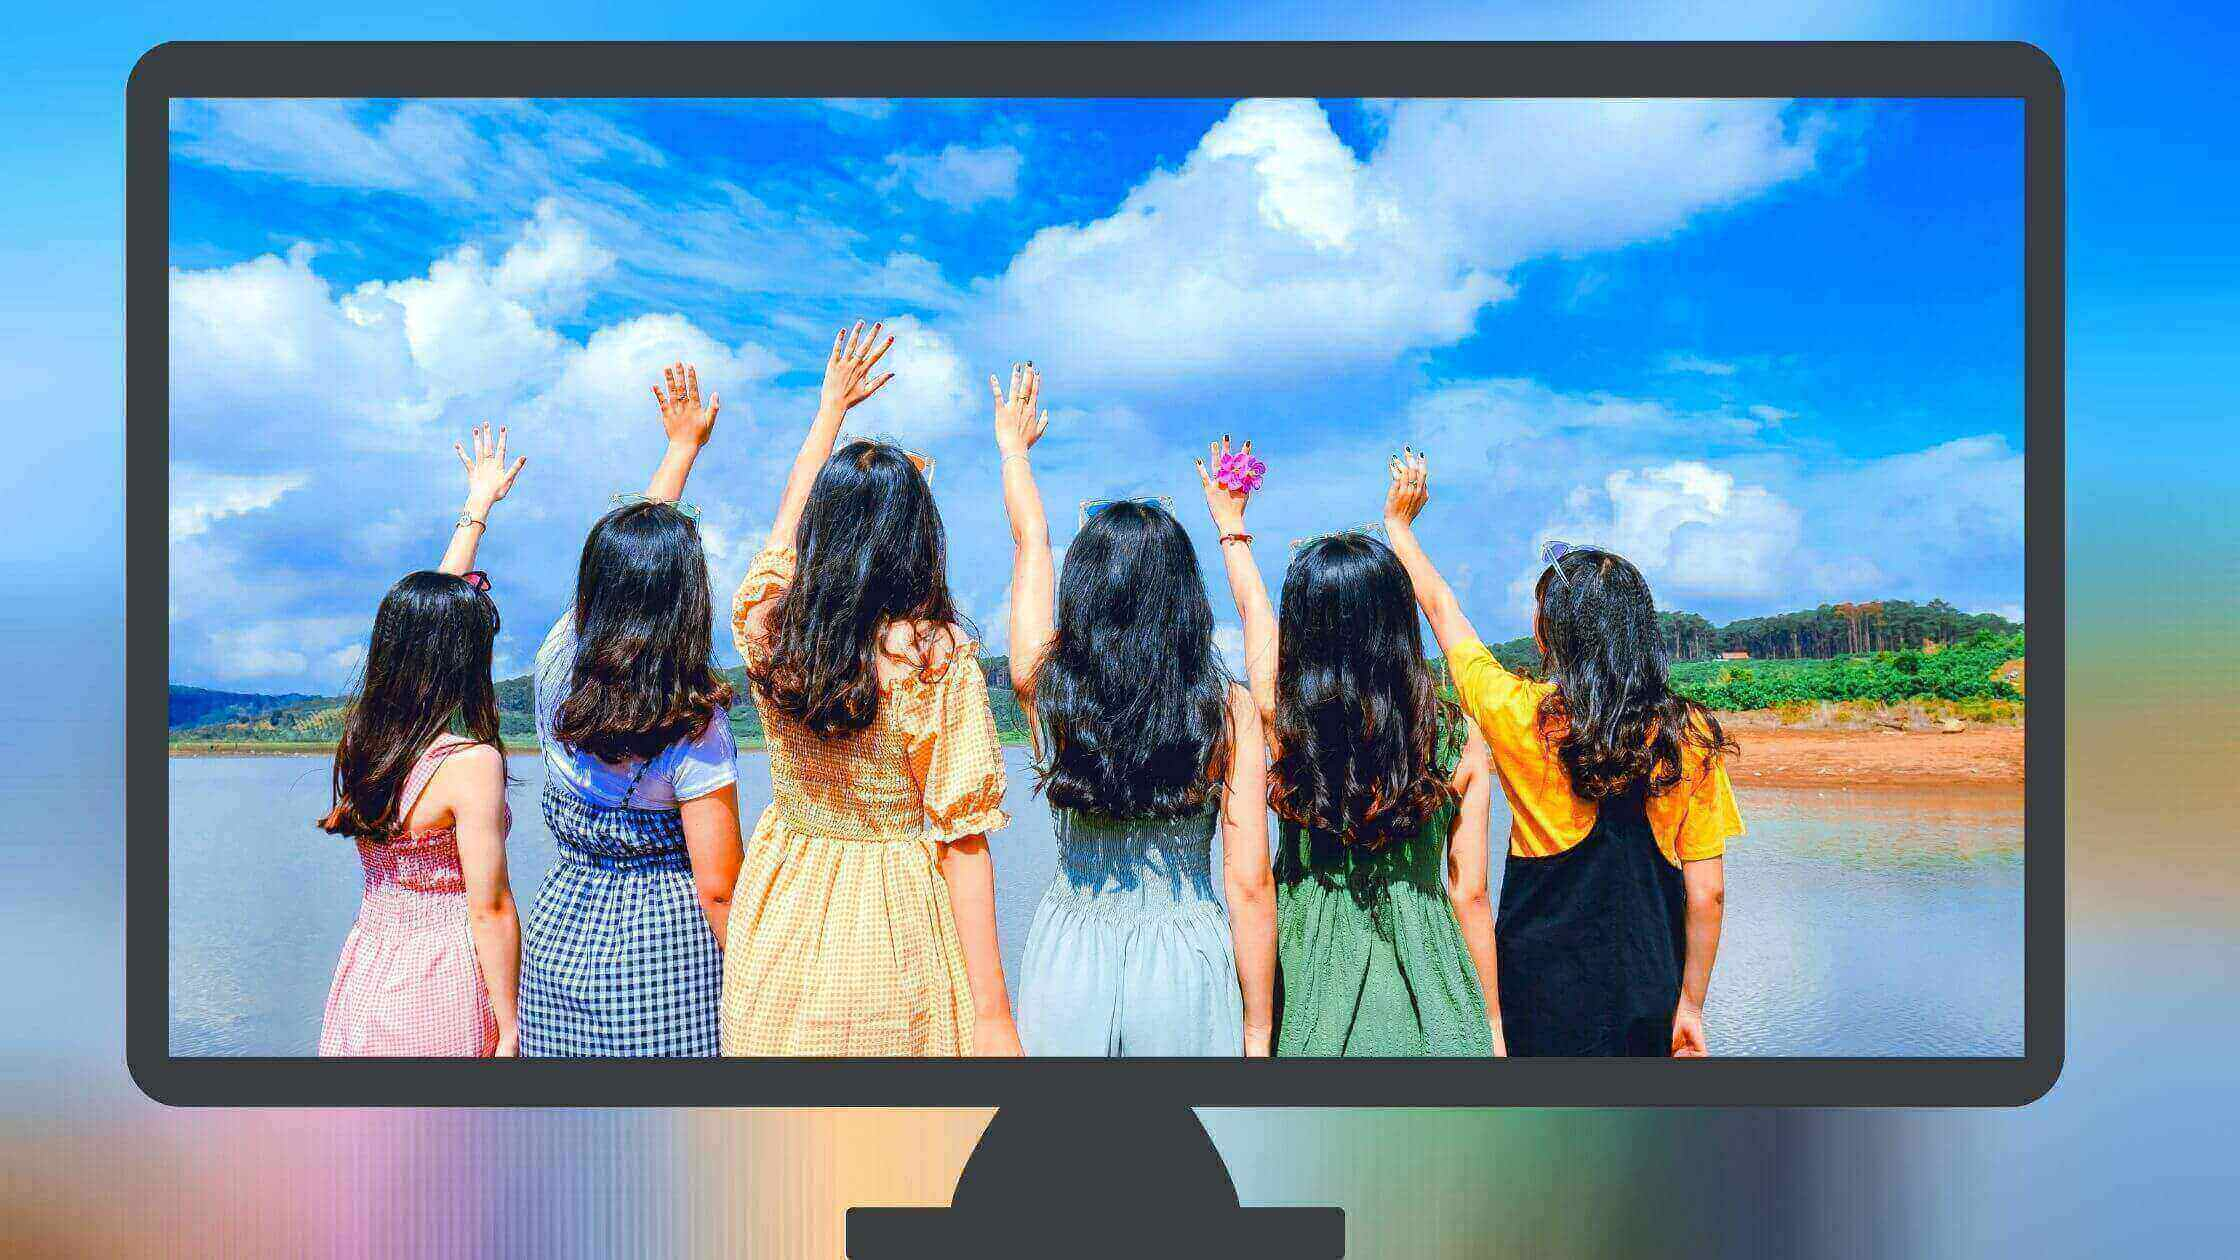 10 Best Photo Viewer For Windows 10 Fmj Tech